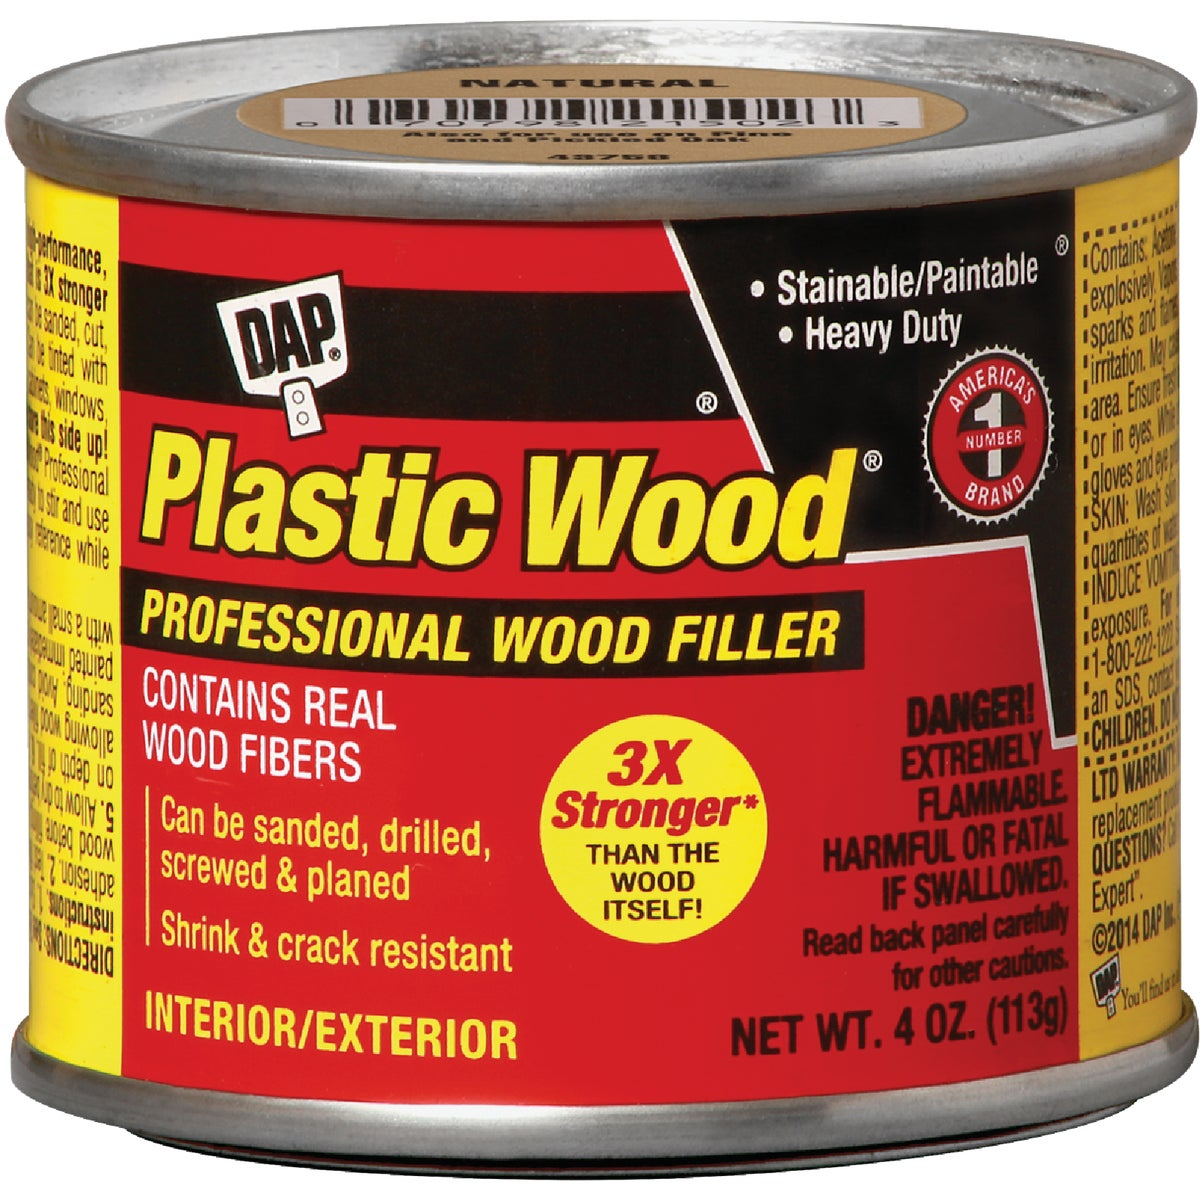 4OZ PINE PLASTIC WOOD - 21404 by Dap Inc